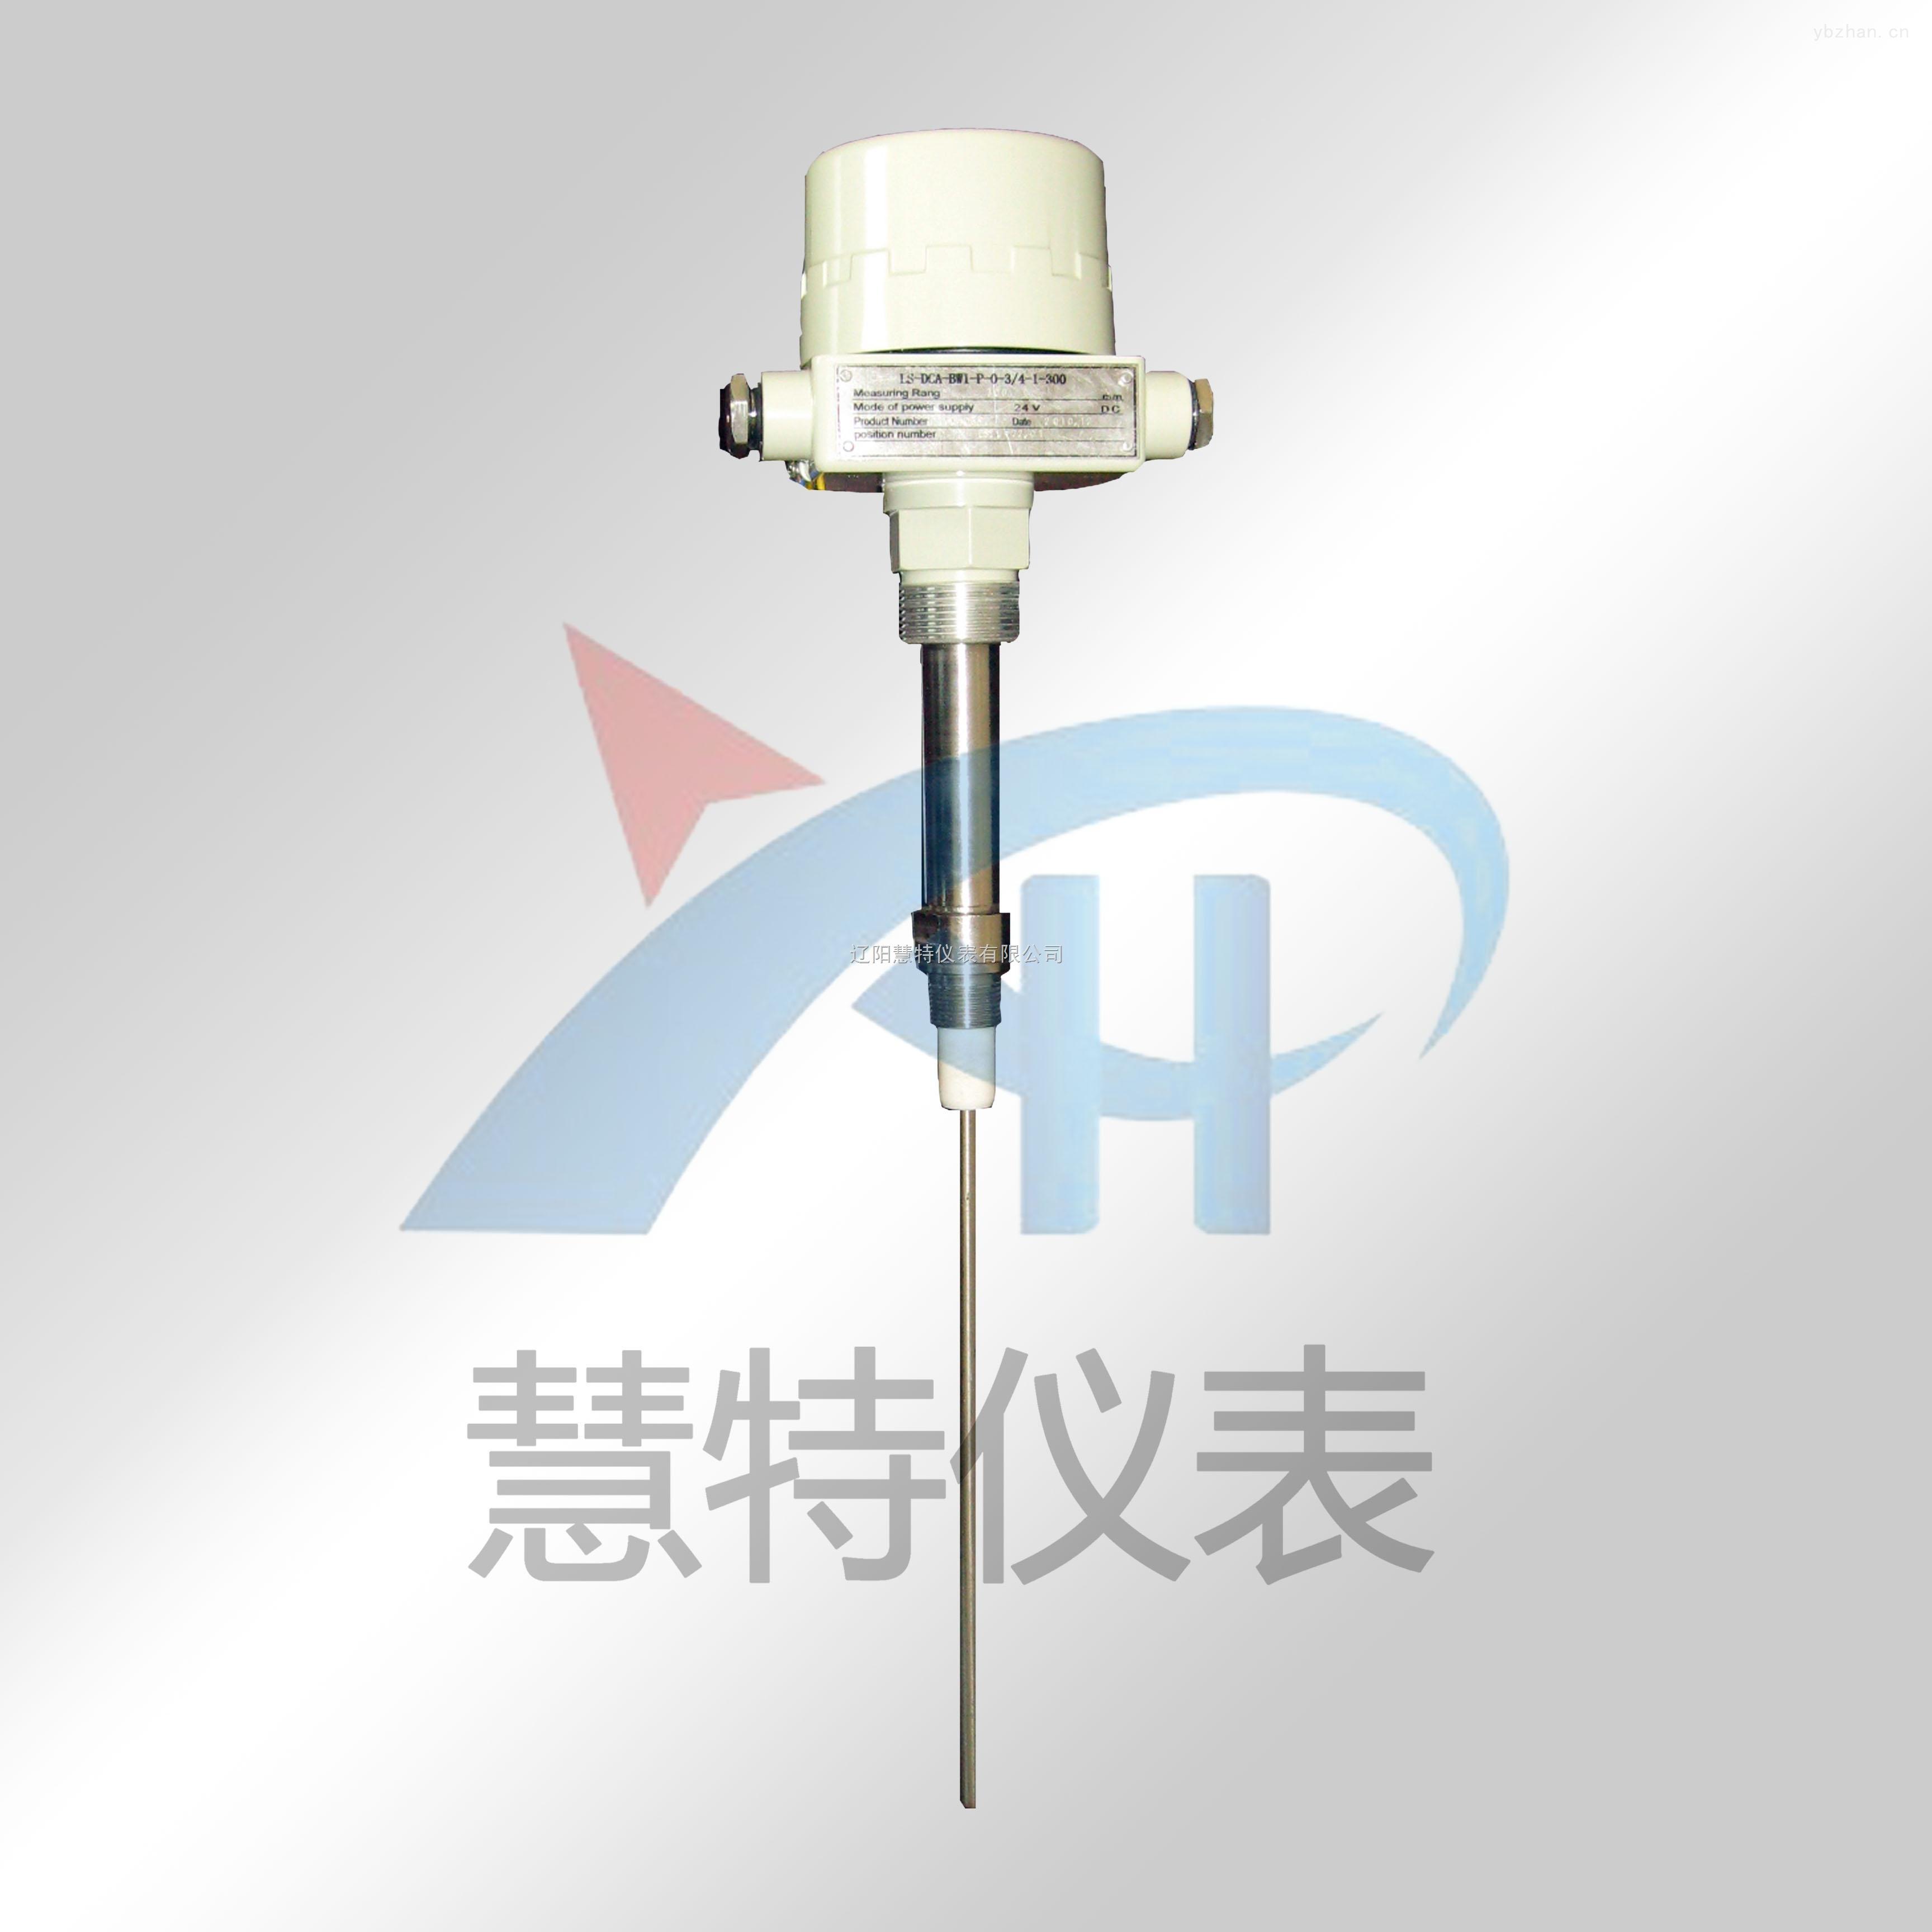 BINDICATORRF系列射频导纳料位控制器